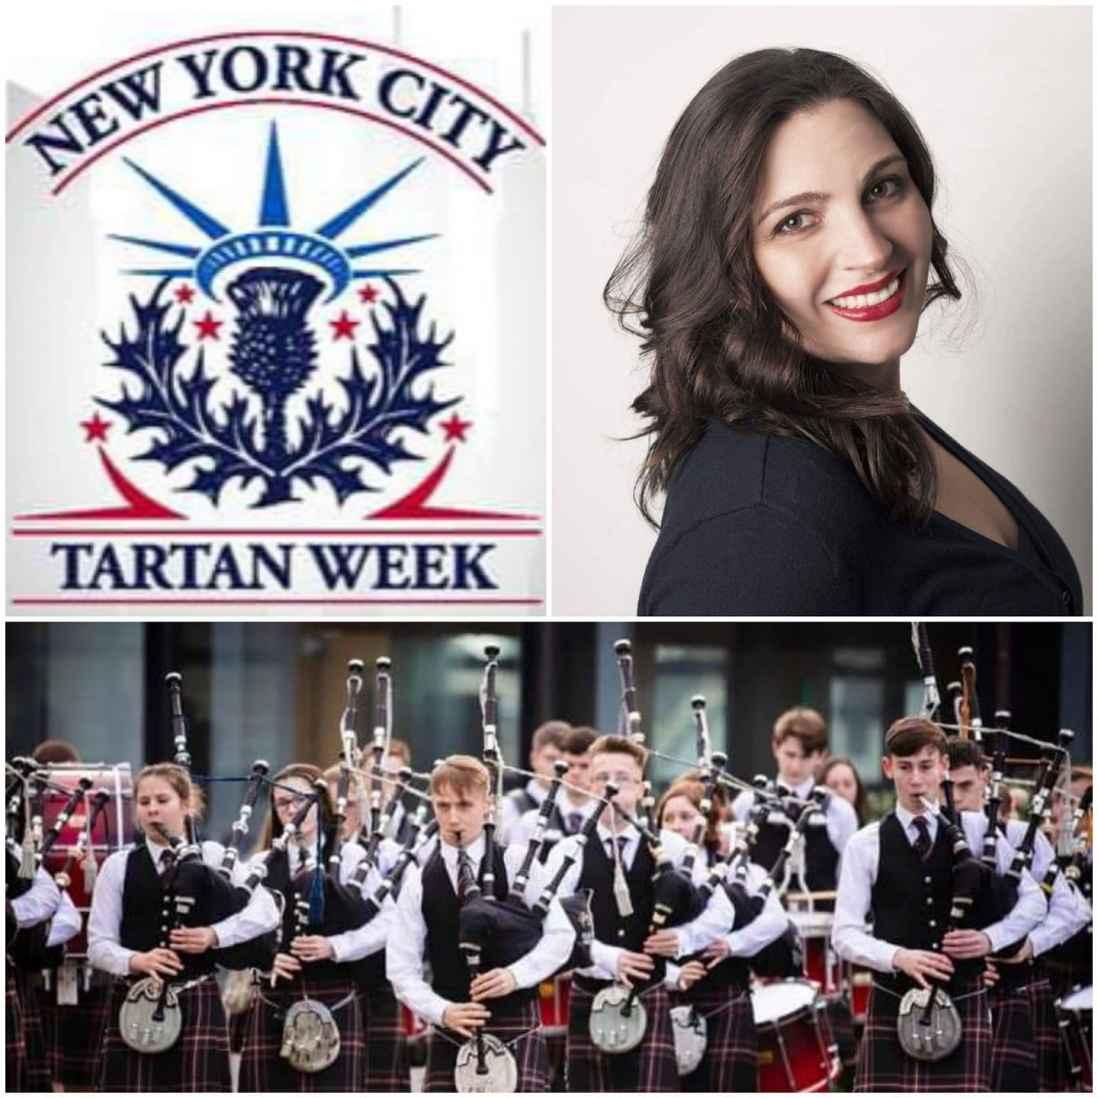 Tartan Week Festivities - New York City